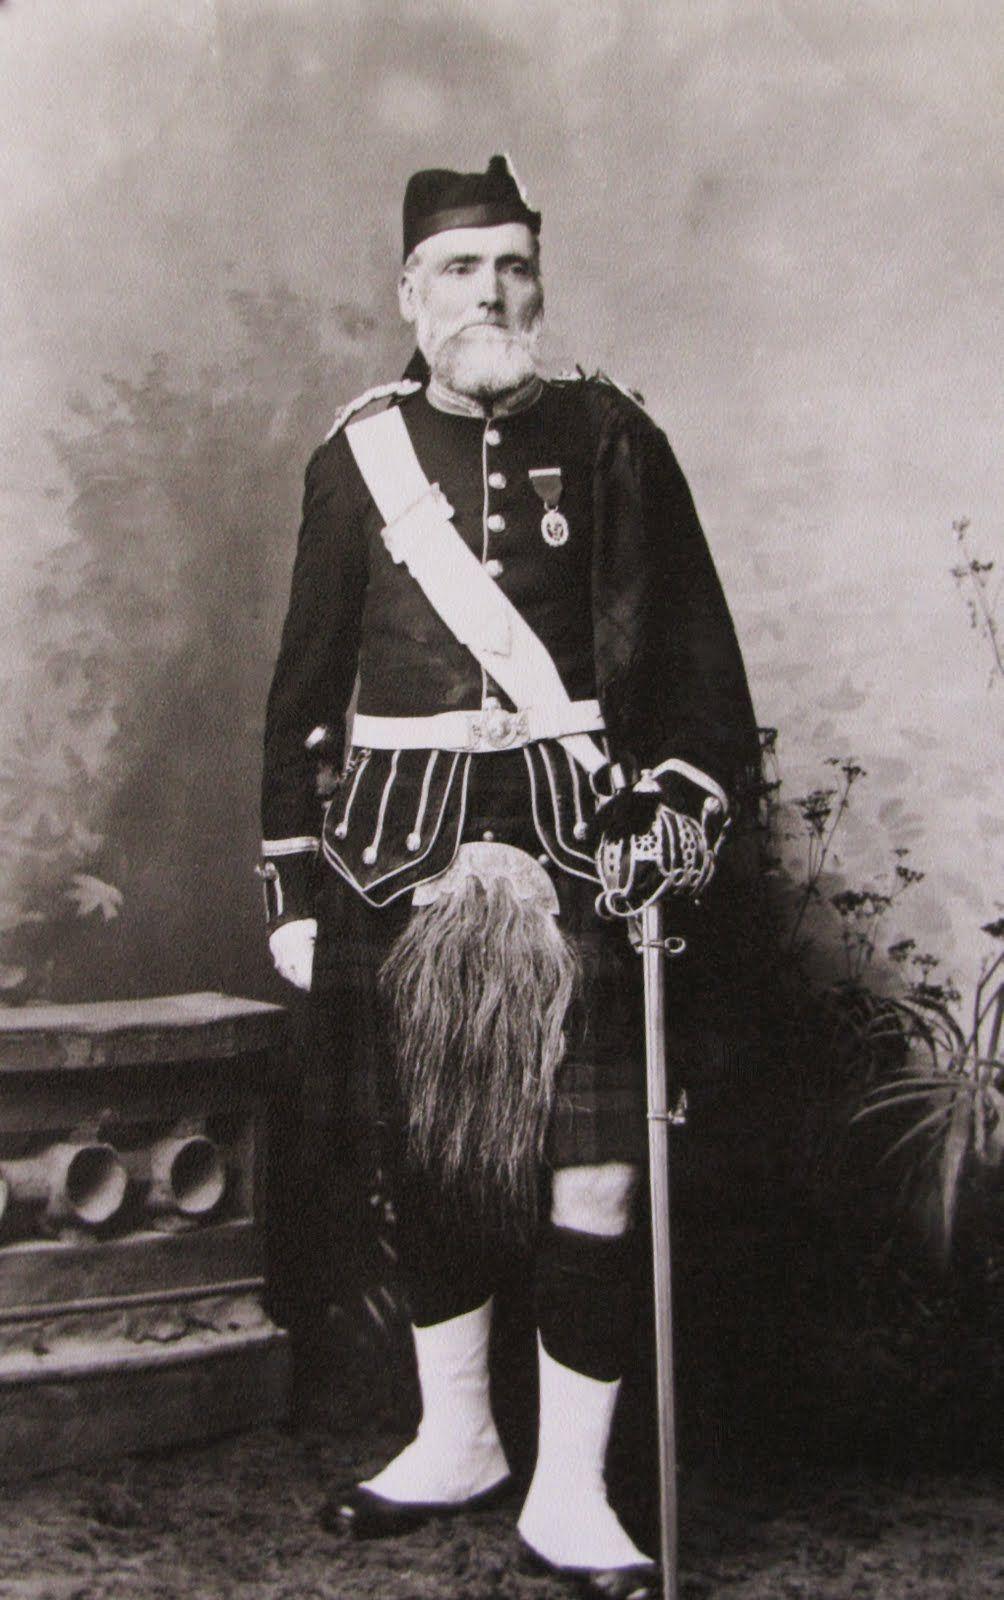 Major Alexander Coghill, 1st Sutherland Highland Rifle Volunteers